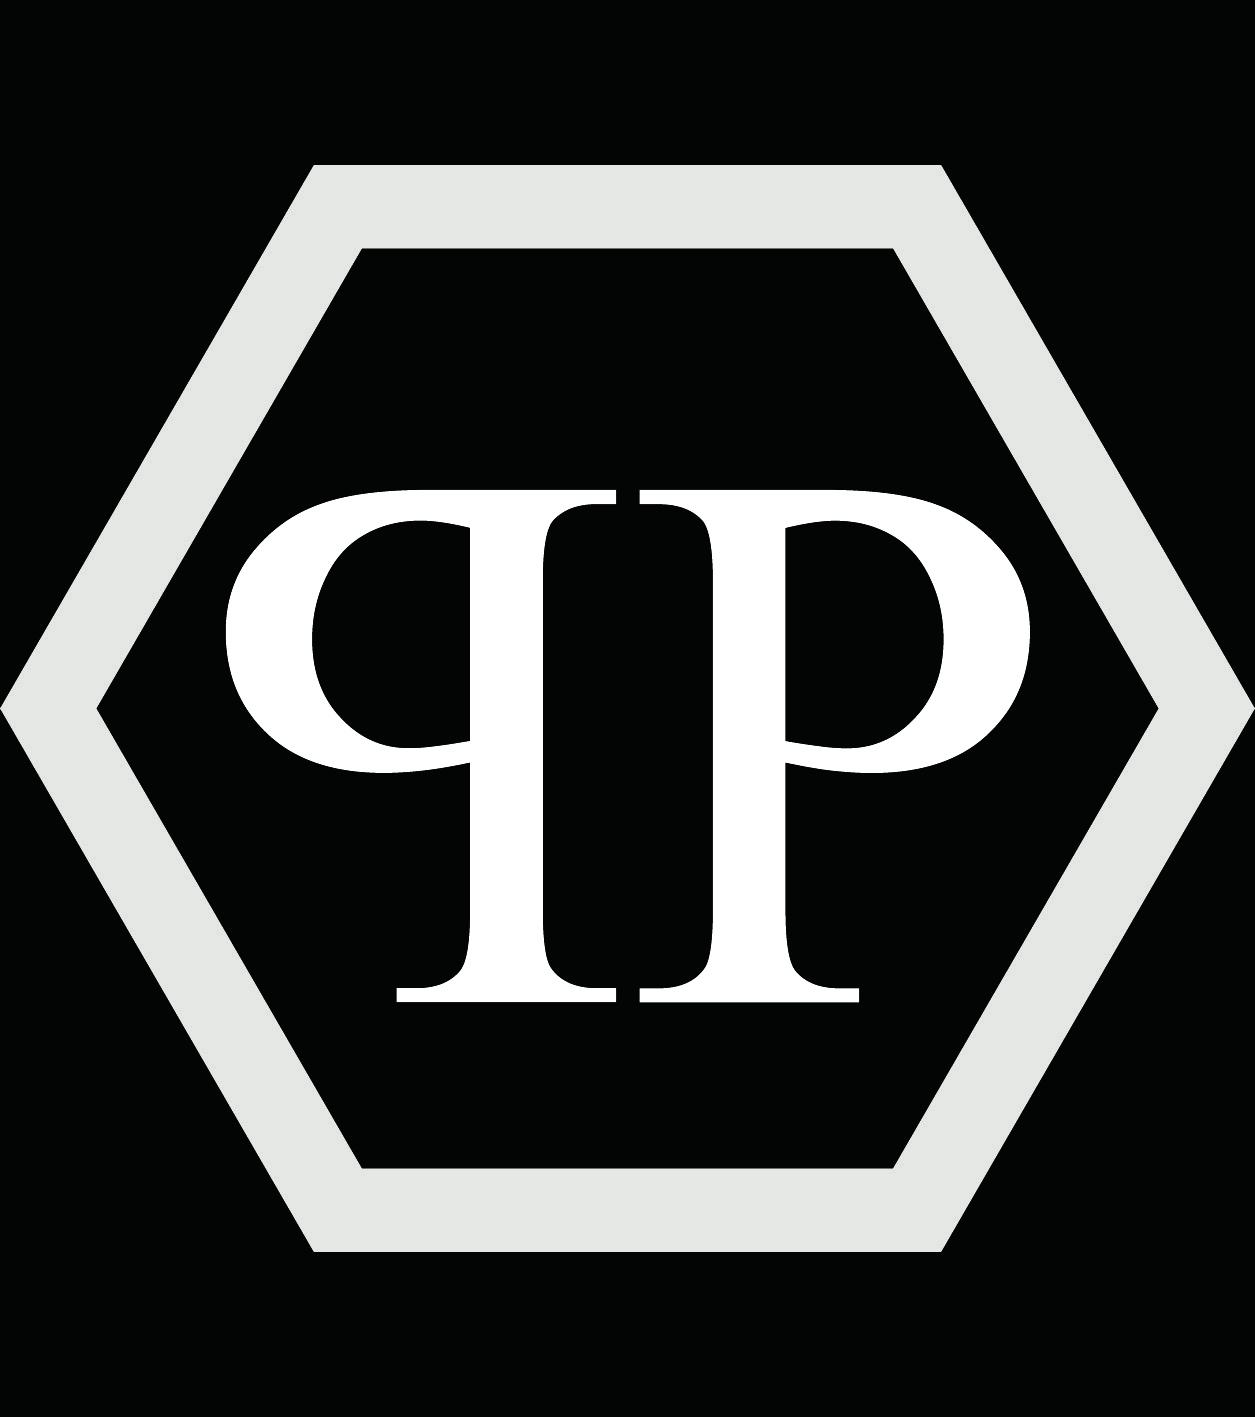 philip Plein logo philipp plein Pinterest Philip